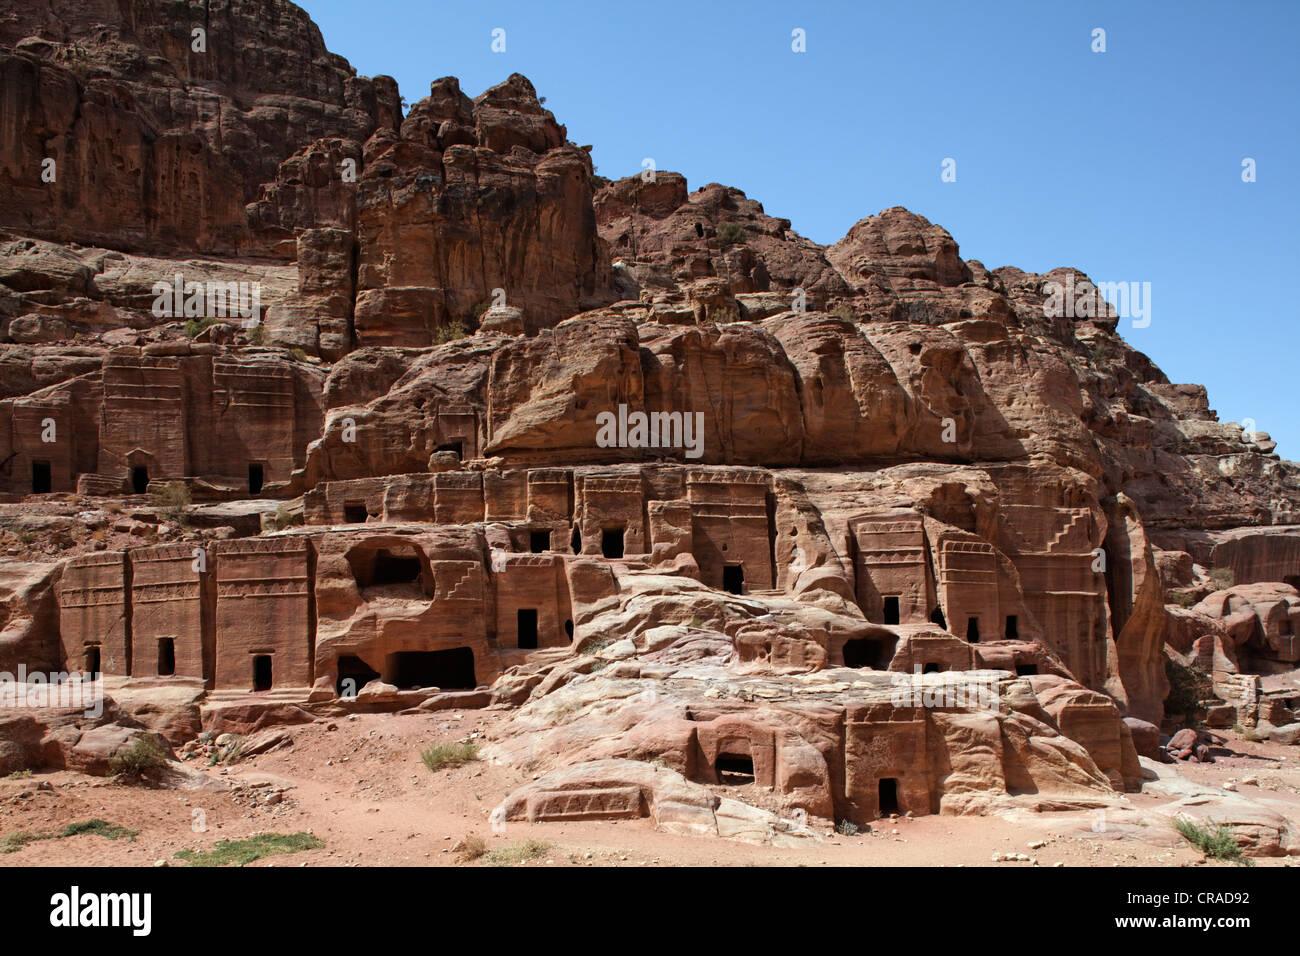 Rock Tombs, Pétra, capitale des Nabatéens, rock city, UNESCO World Hertage Site, Wadi Musa Photo Stock